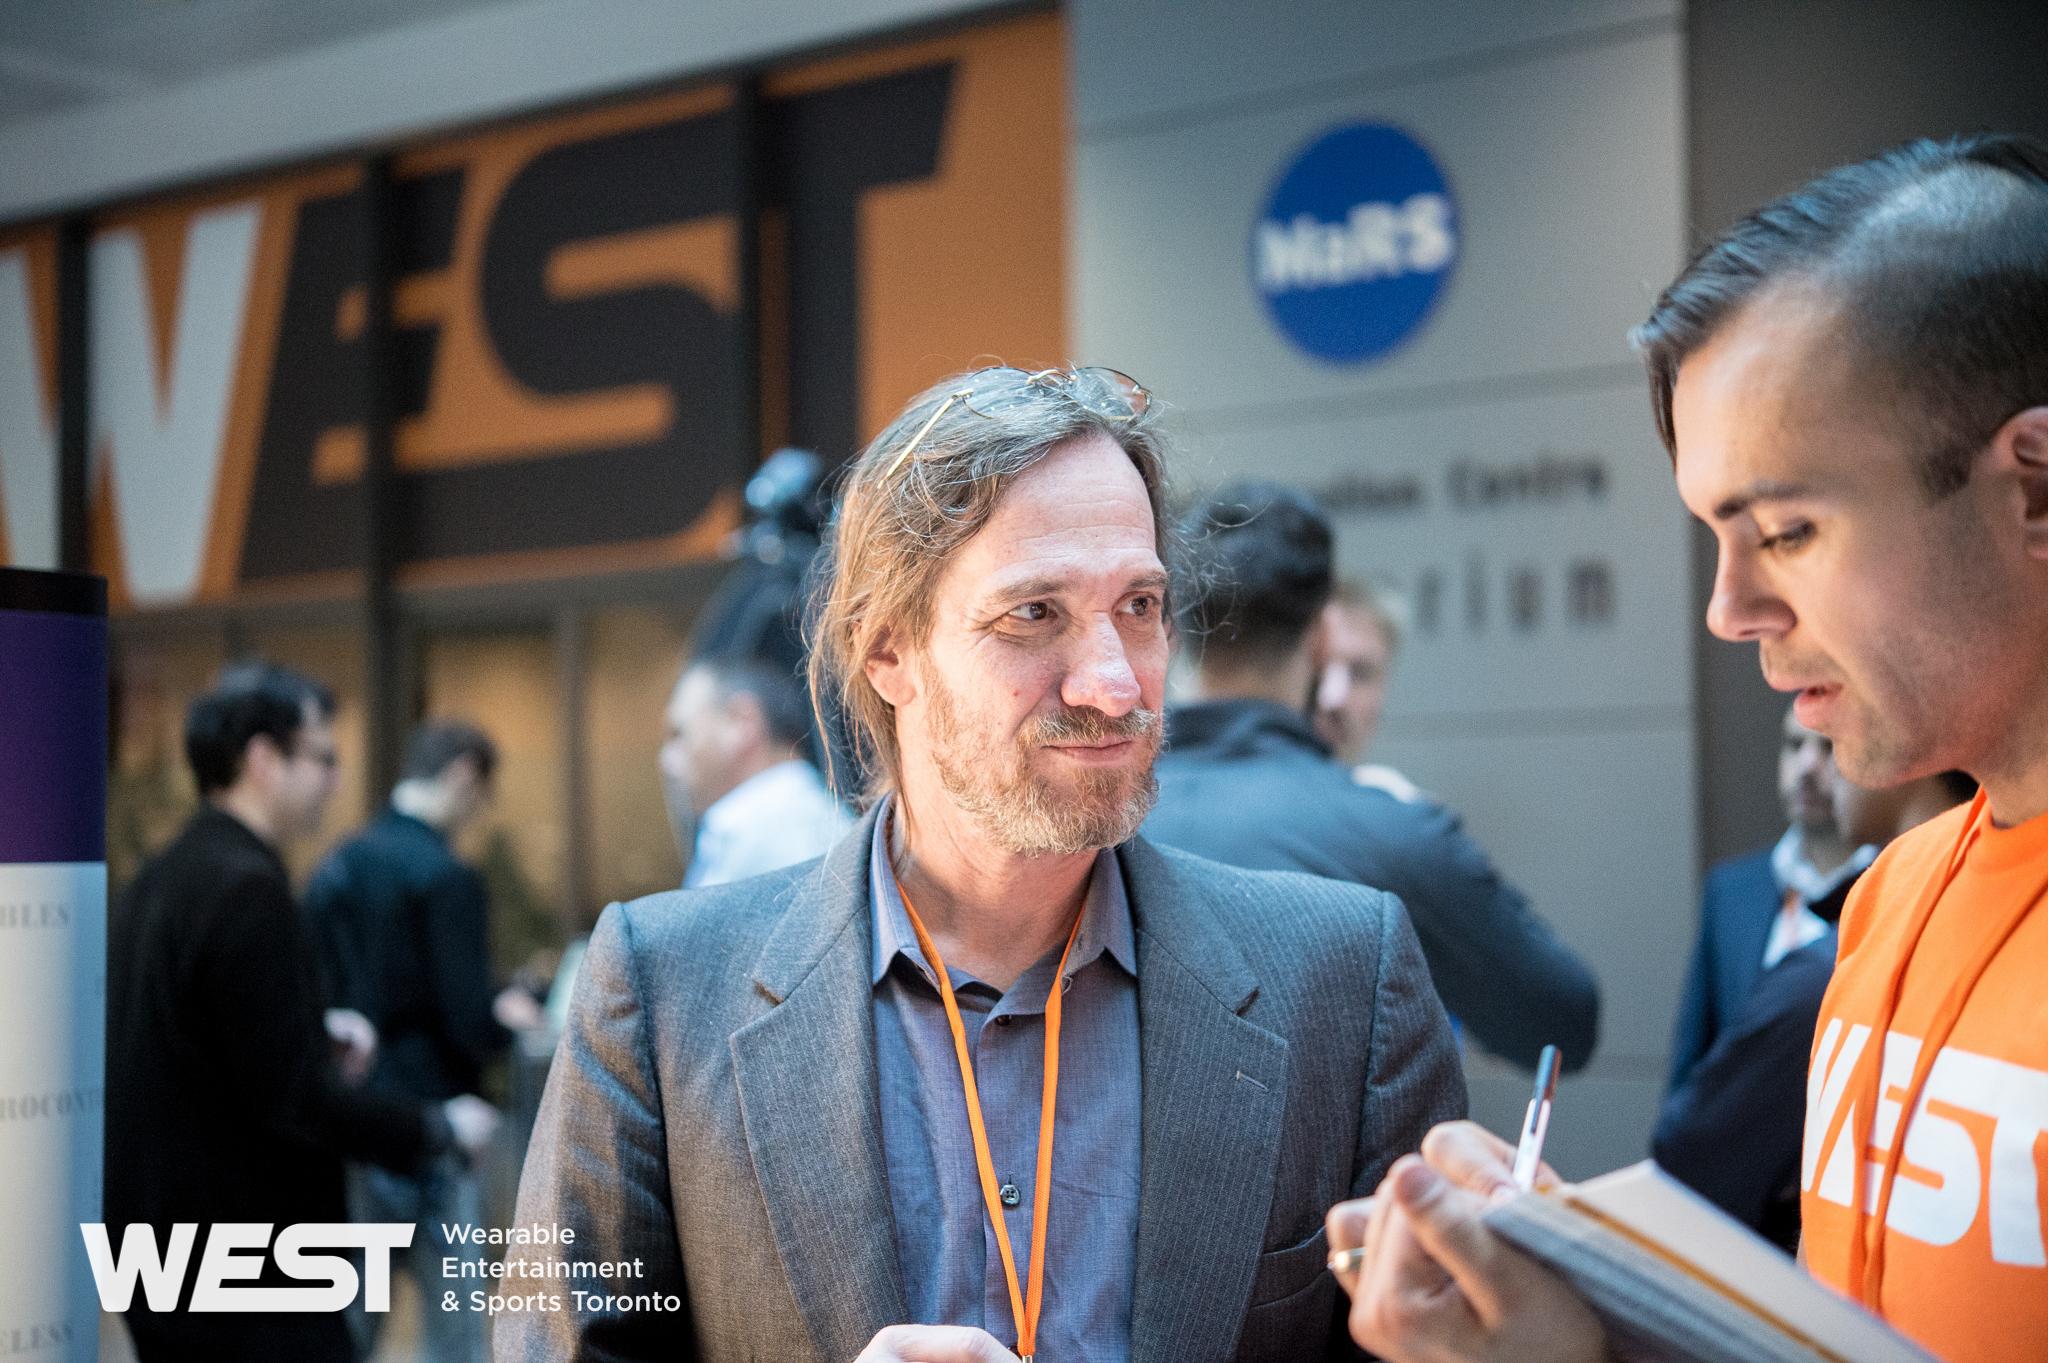 WEST2015-MaRS-Tarsipix-151103-7992.jpg